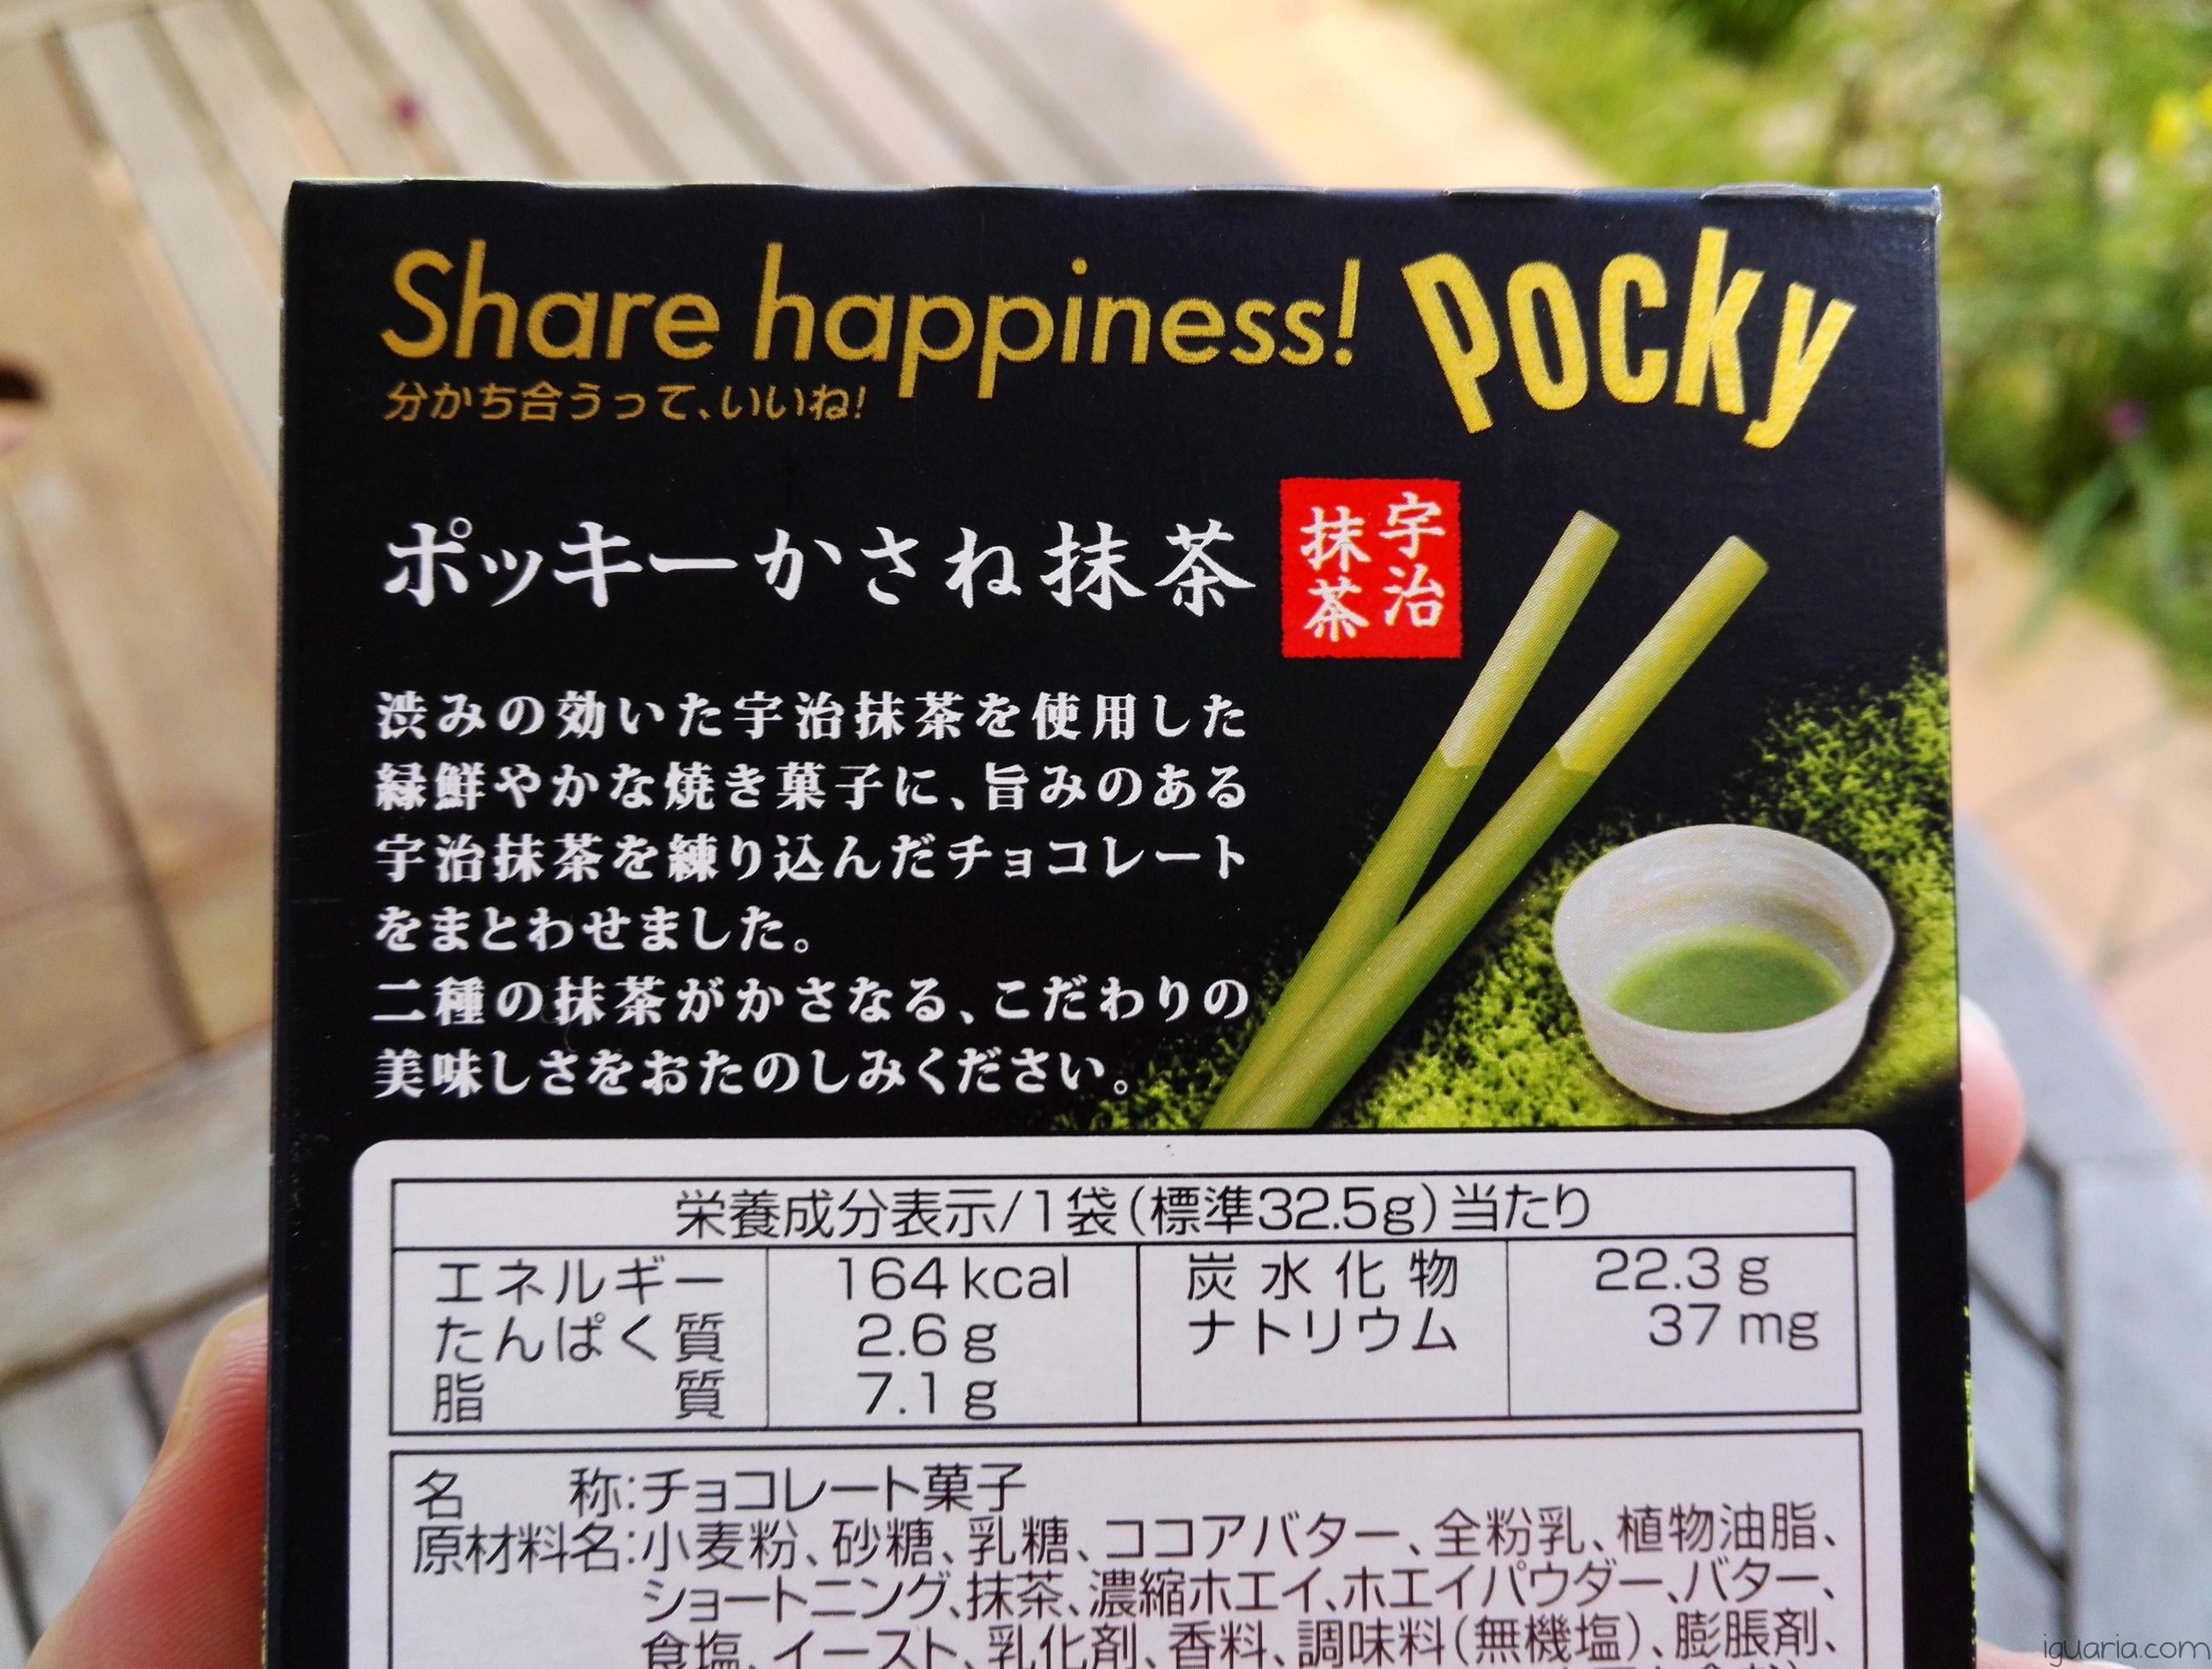 Iguaria_Ingredientes-Pocky-de-Matcha